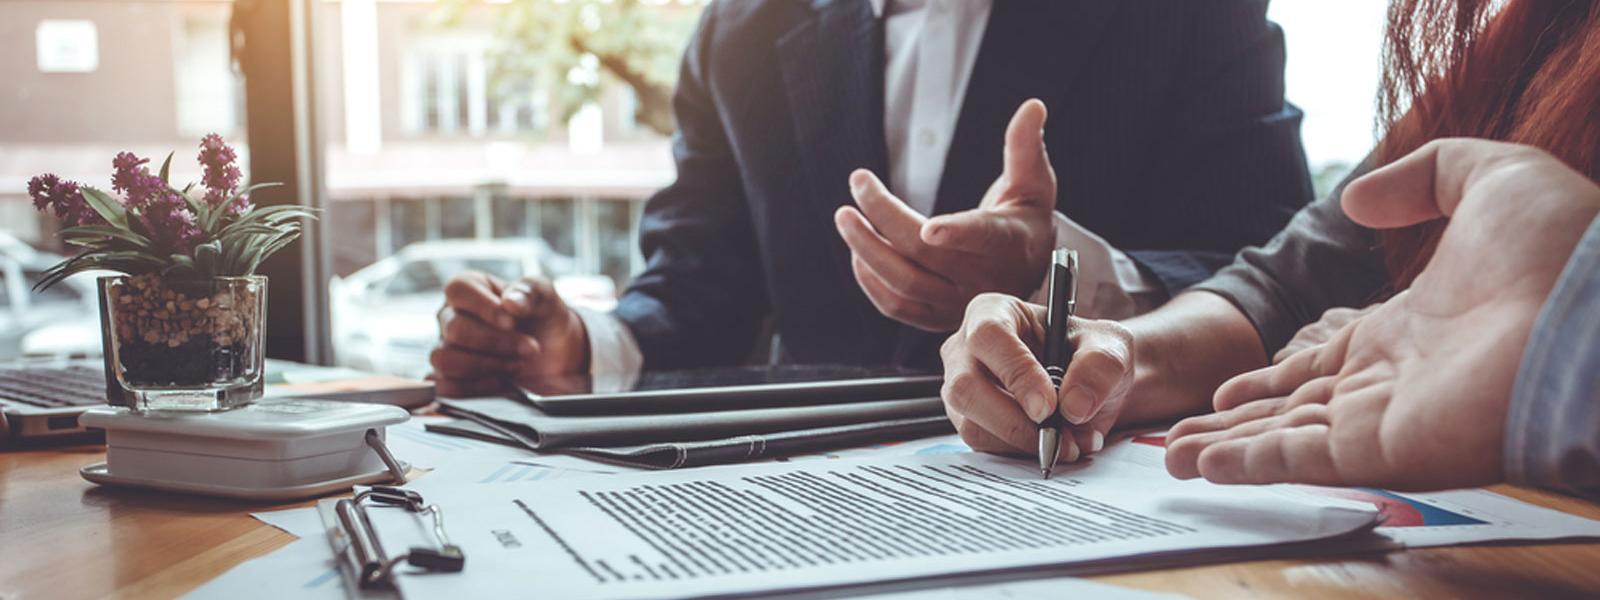 Valliant Group Announces Major Investment In German Headquarter